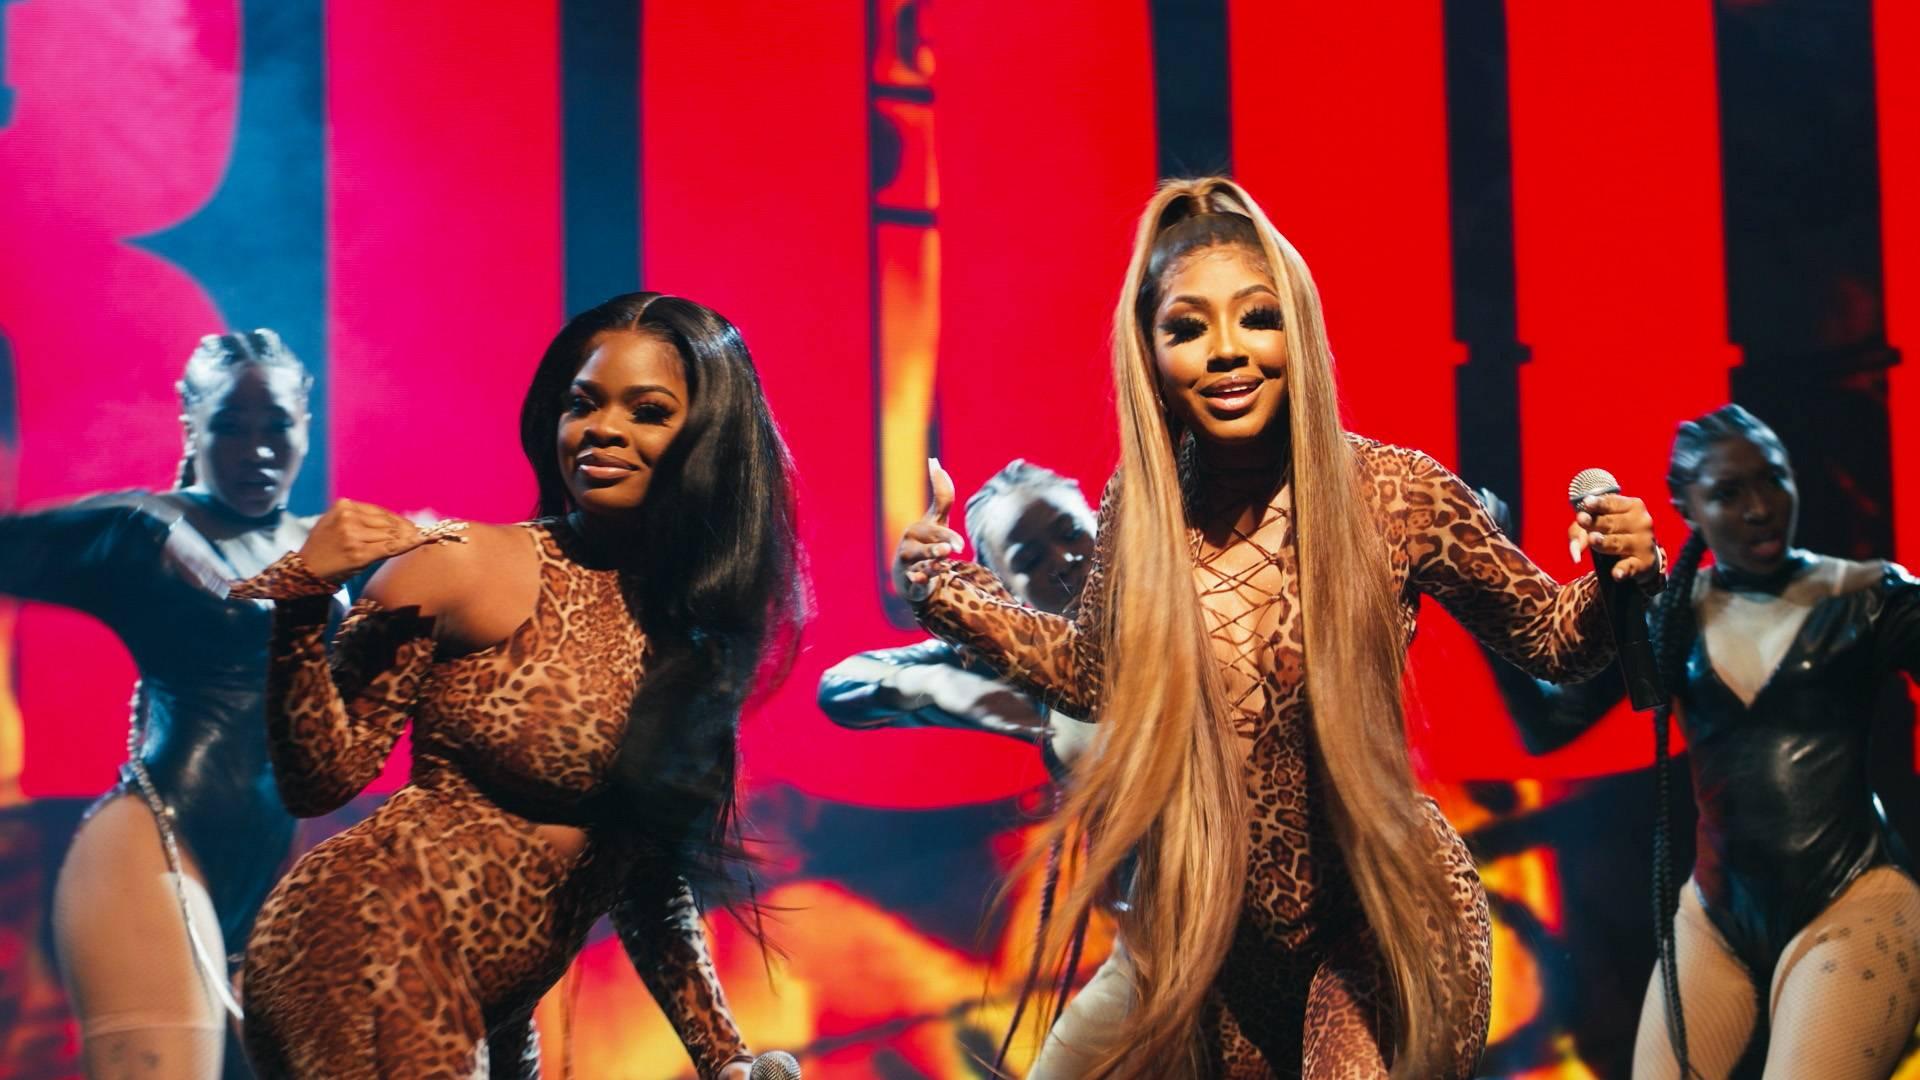 Hip Hop Awards 2020 | Show Highlights Gallery City Girls | 1920x1080